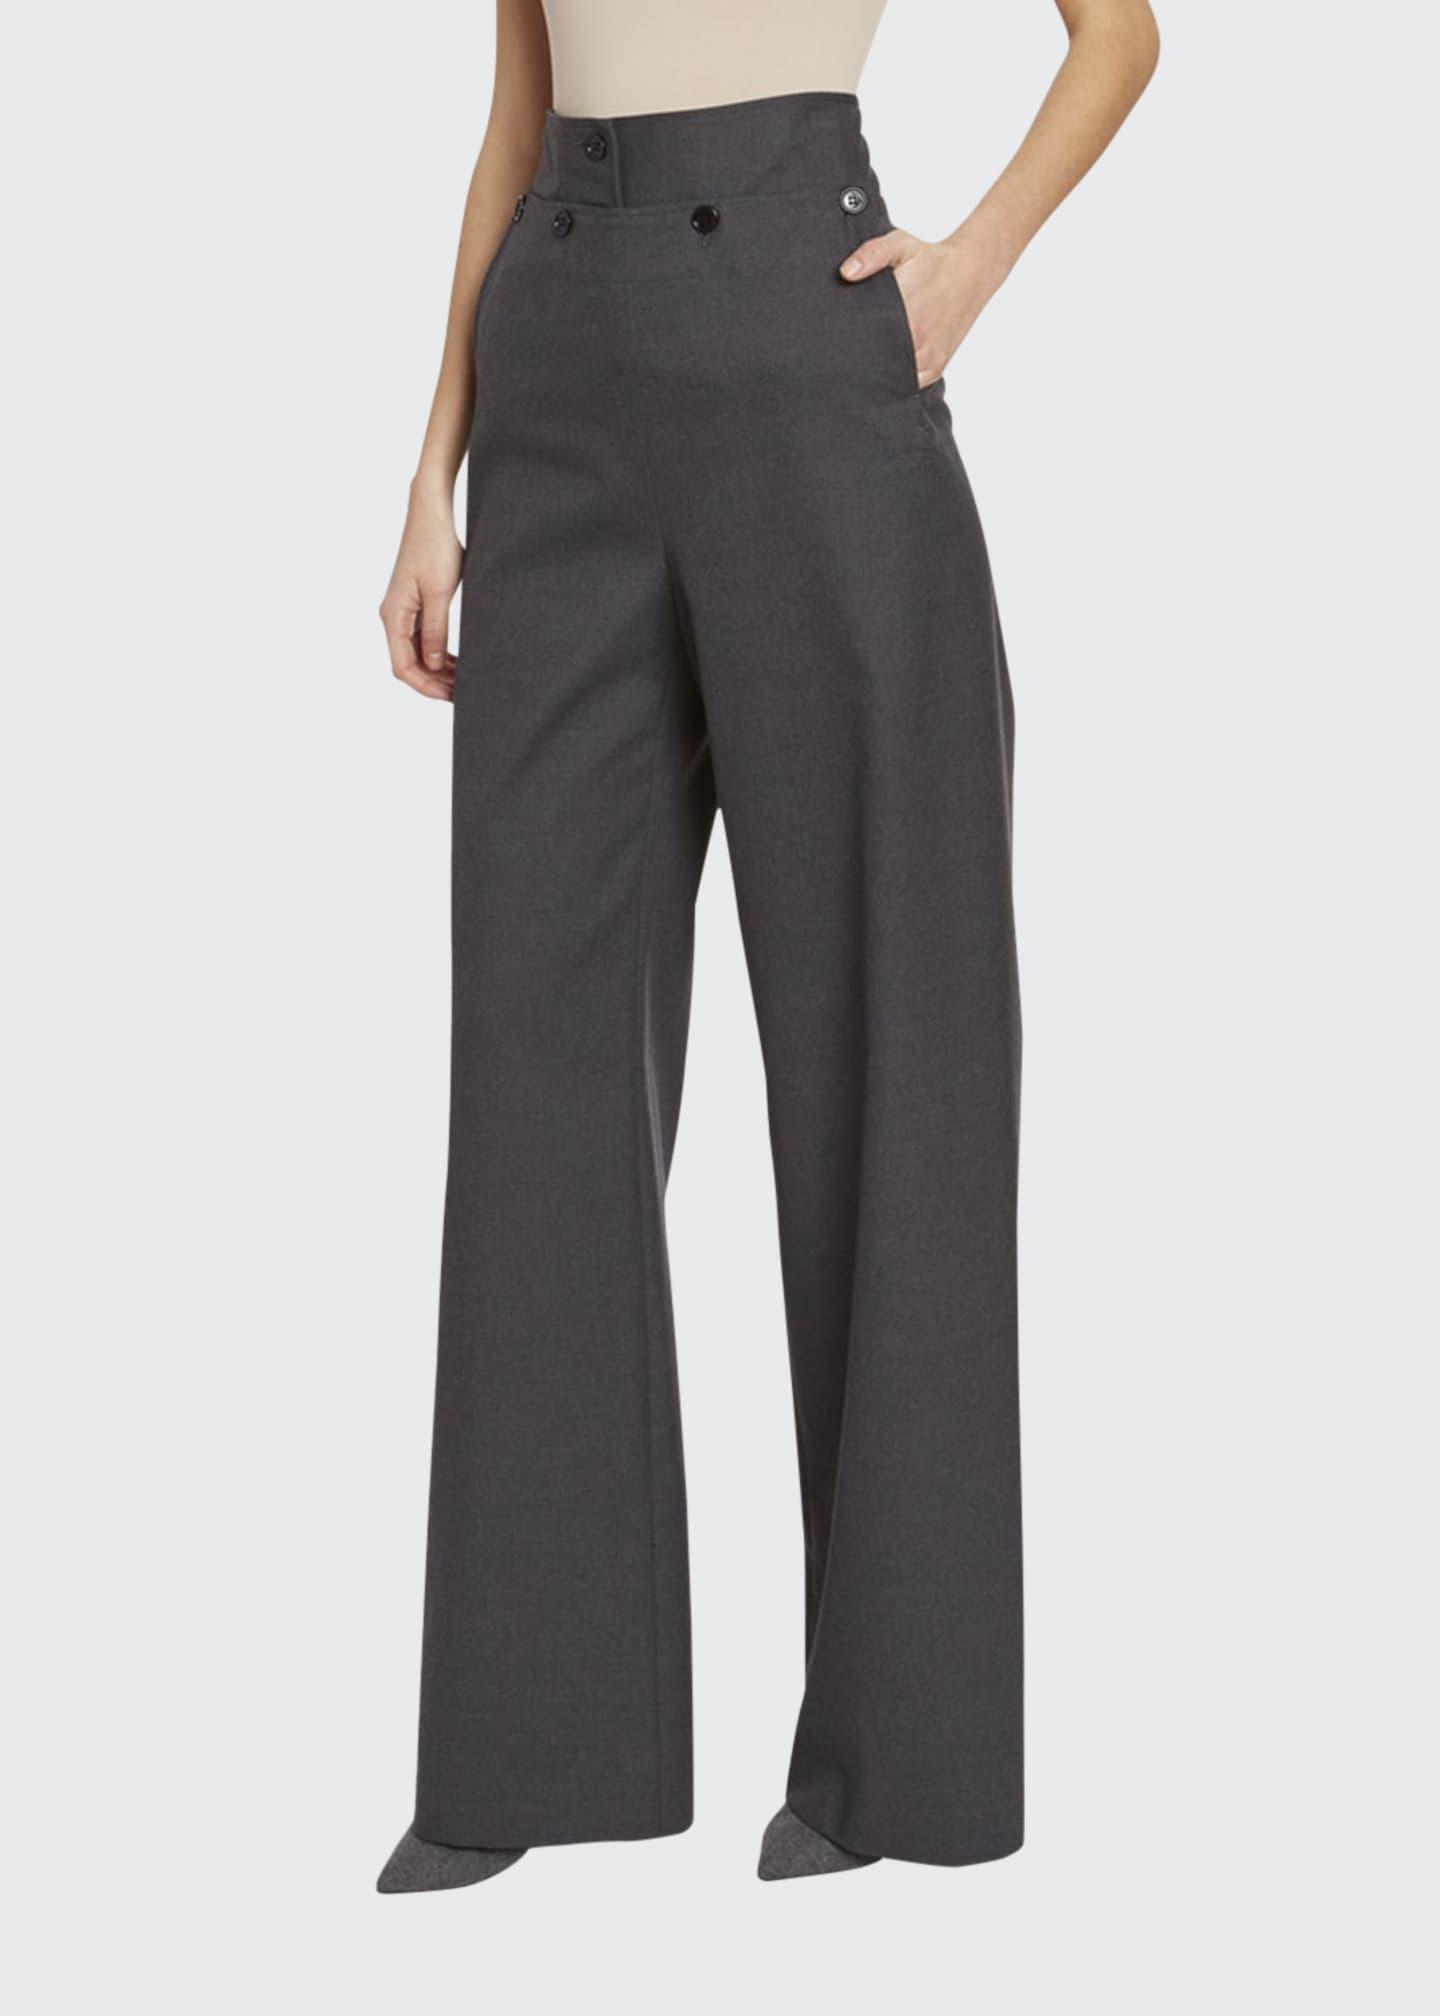 Dries Van Noten Wool High-Rise Sailor Pants